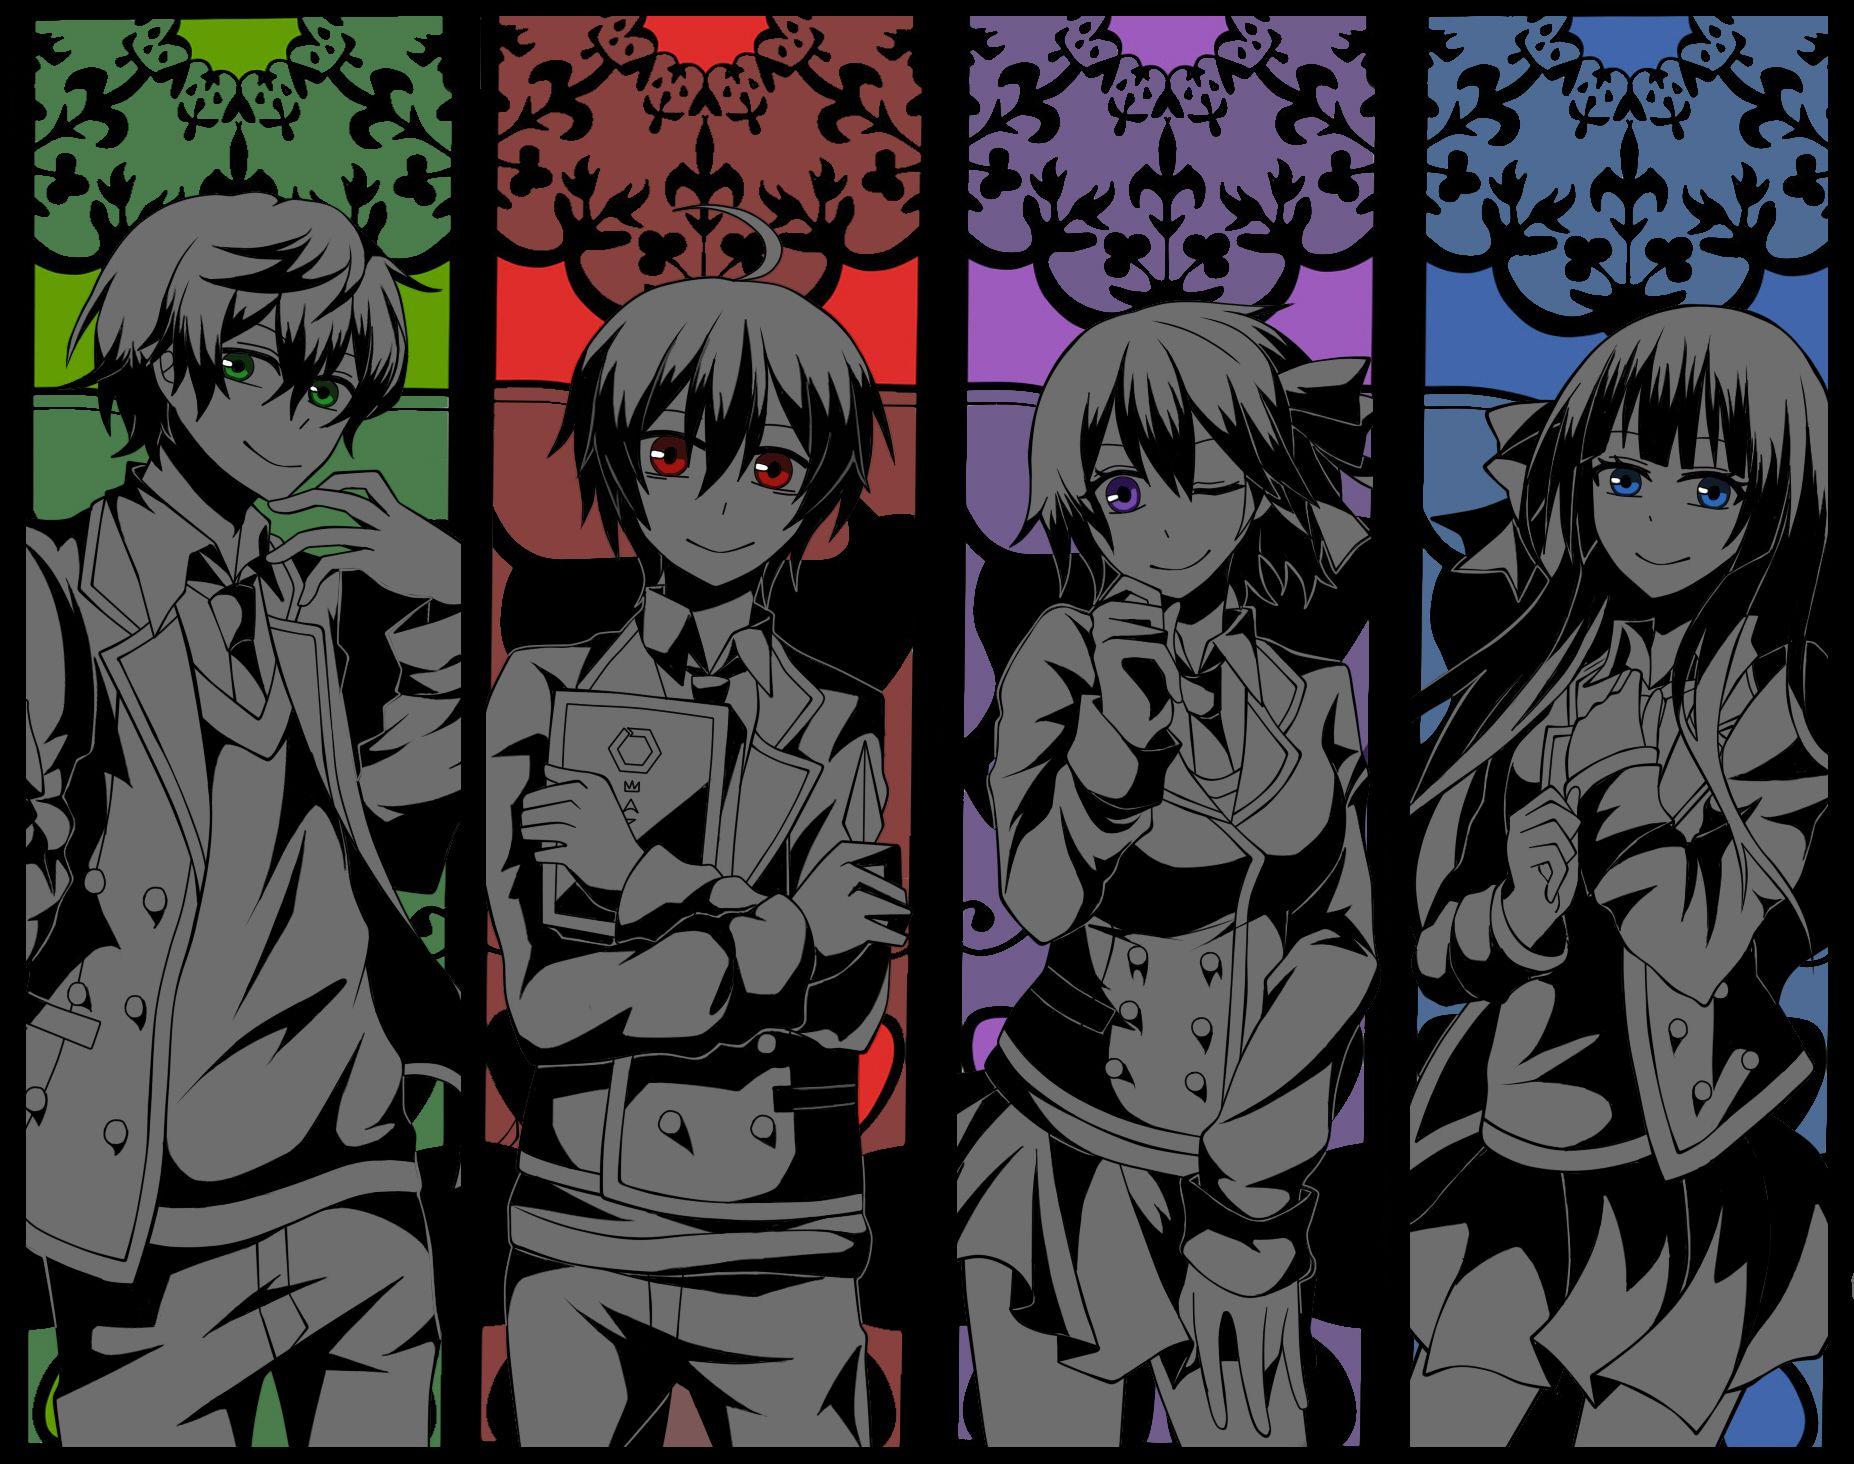 Shuuen no Shiori / Bookmark of Demise Characters: A-ya / B-ko / C-ta / D-ne